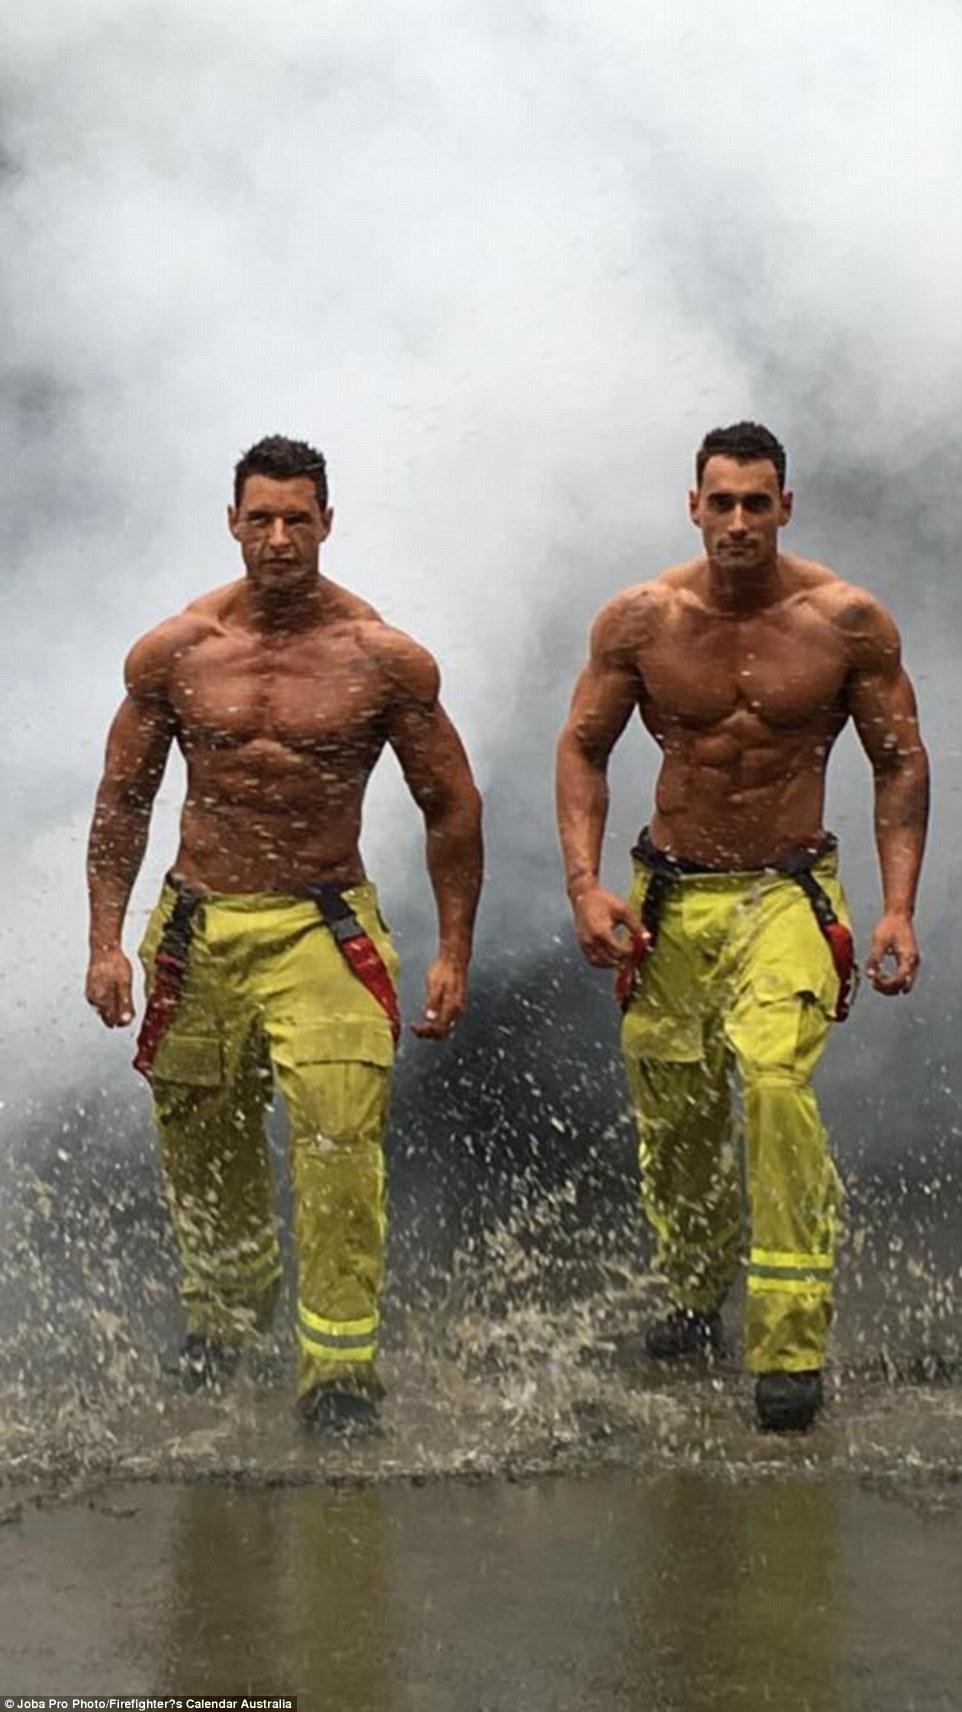 Wallpaper Hd Cute For Men Firefighters Strip Off For 2017 Firefighter S Calendar